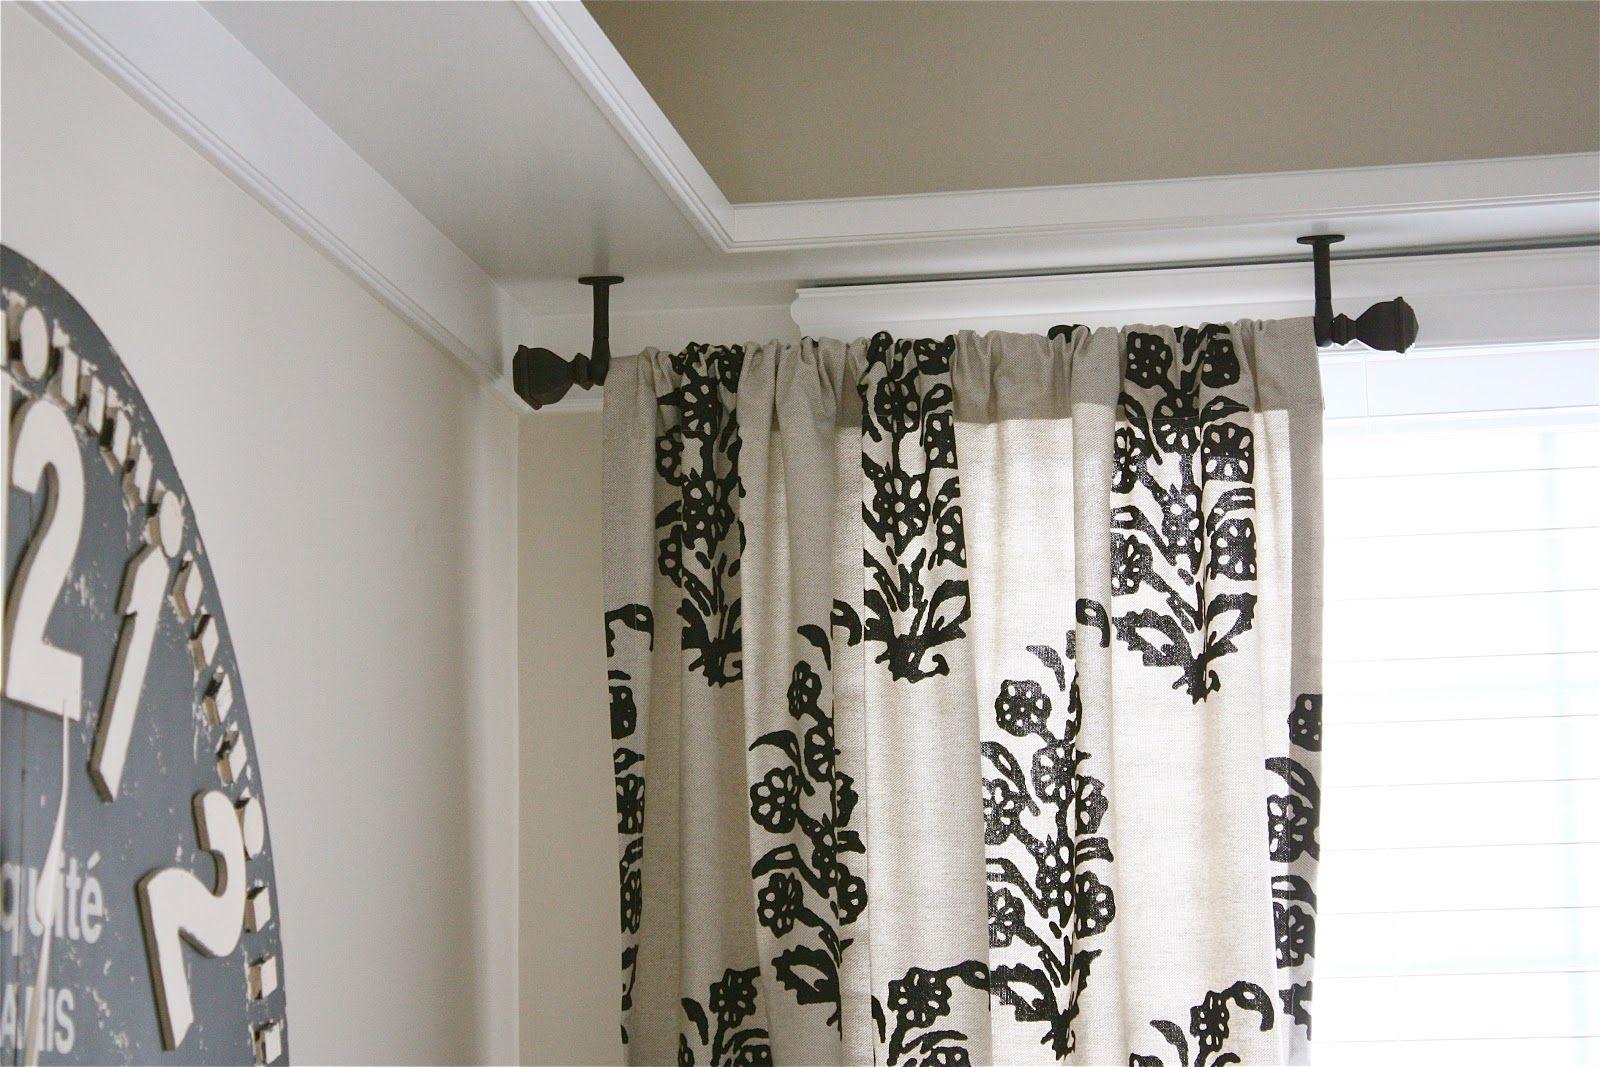 Wonderful Ceiling Mount Curtain Rods Ideas   Http://www.ltgent.com/